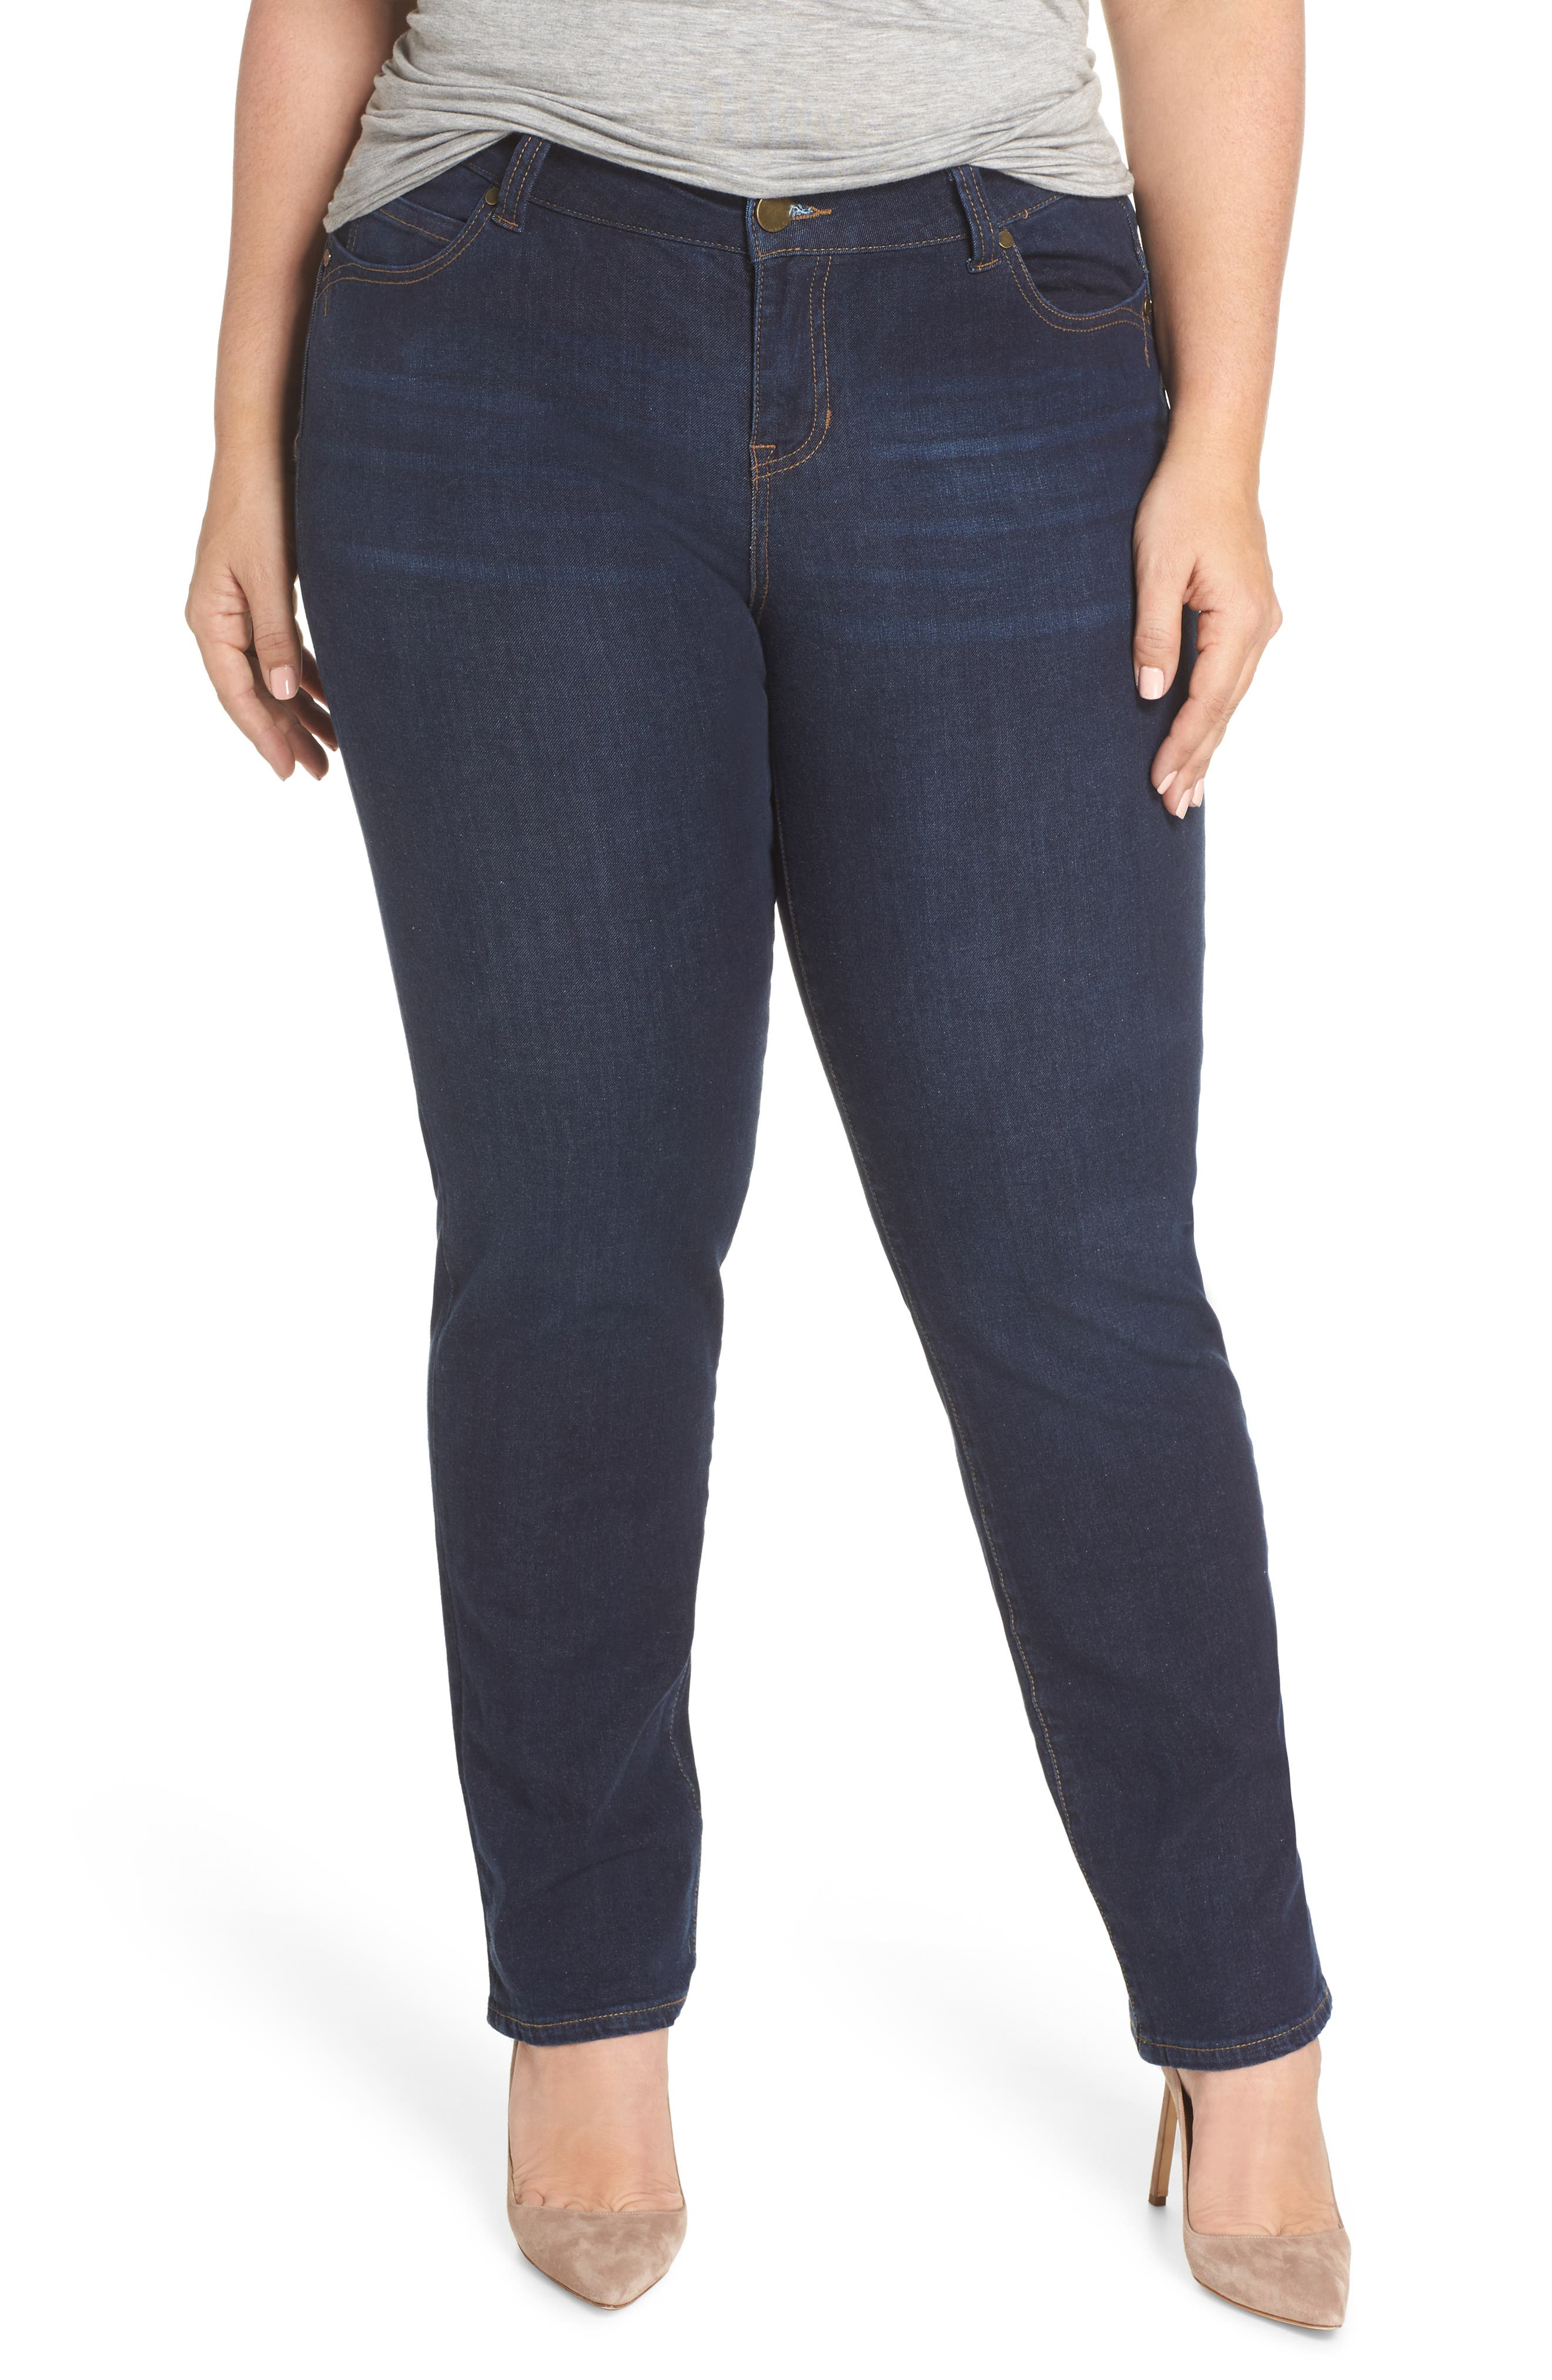 Remy - Hugger Straight Leg Jeans,                             Main thumbnail 1, color,                             CORVUS DARK